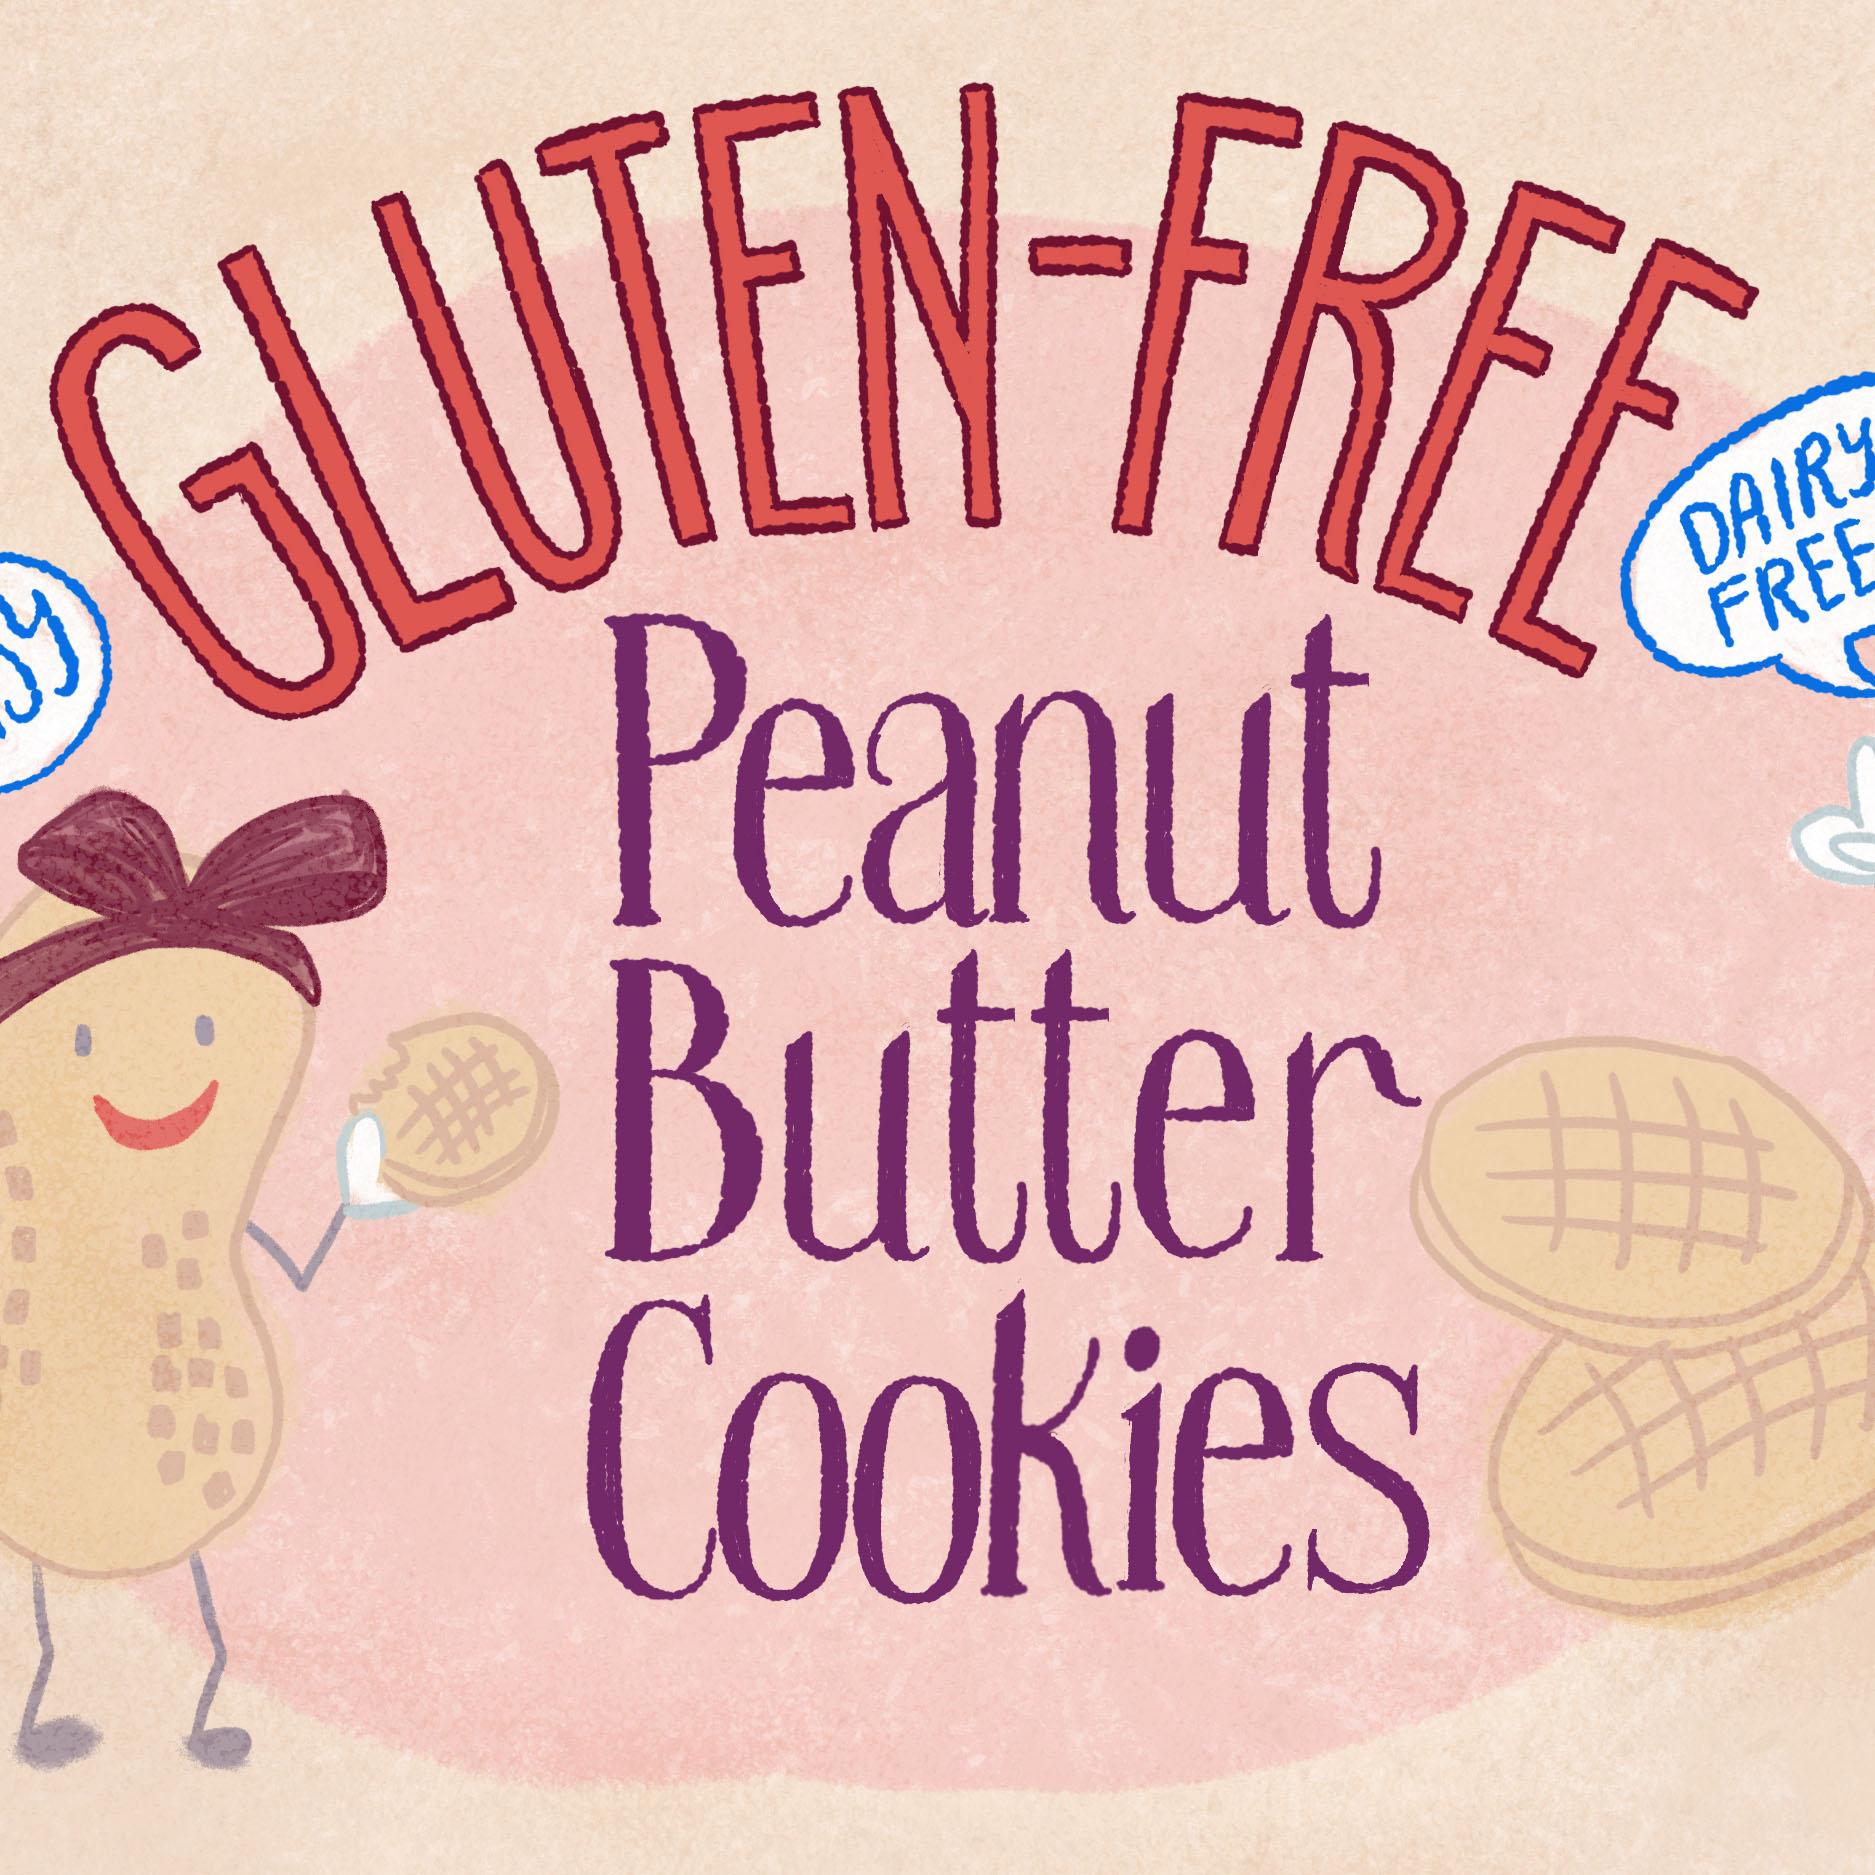 Peanut Butter Cookie Recipe Illustration